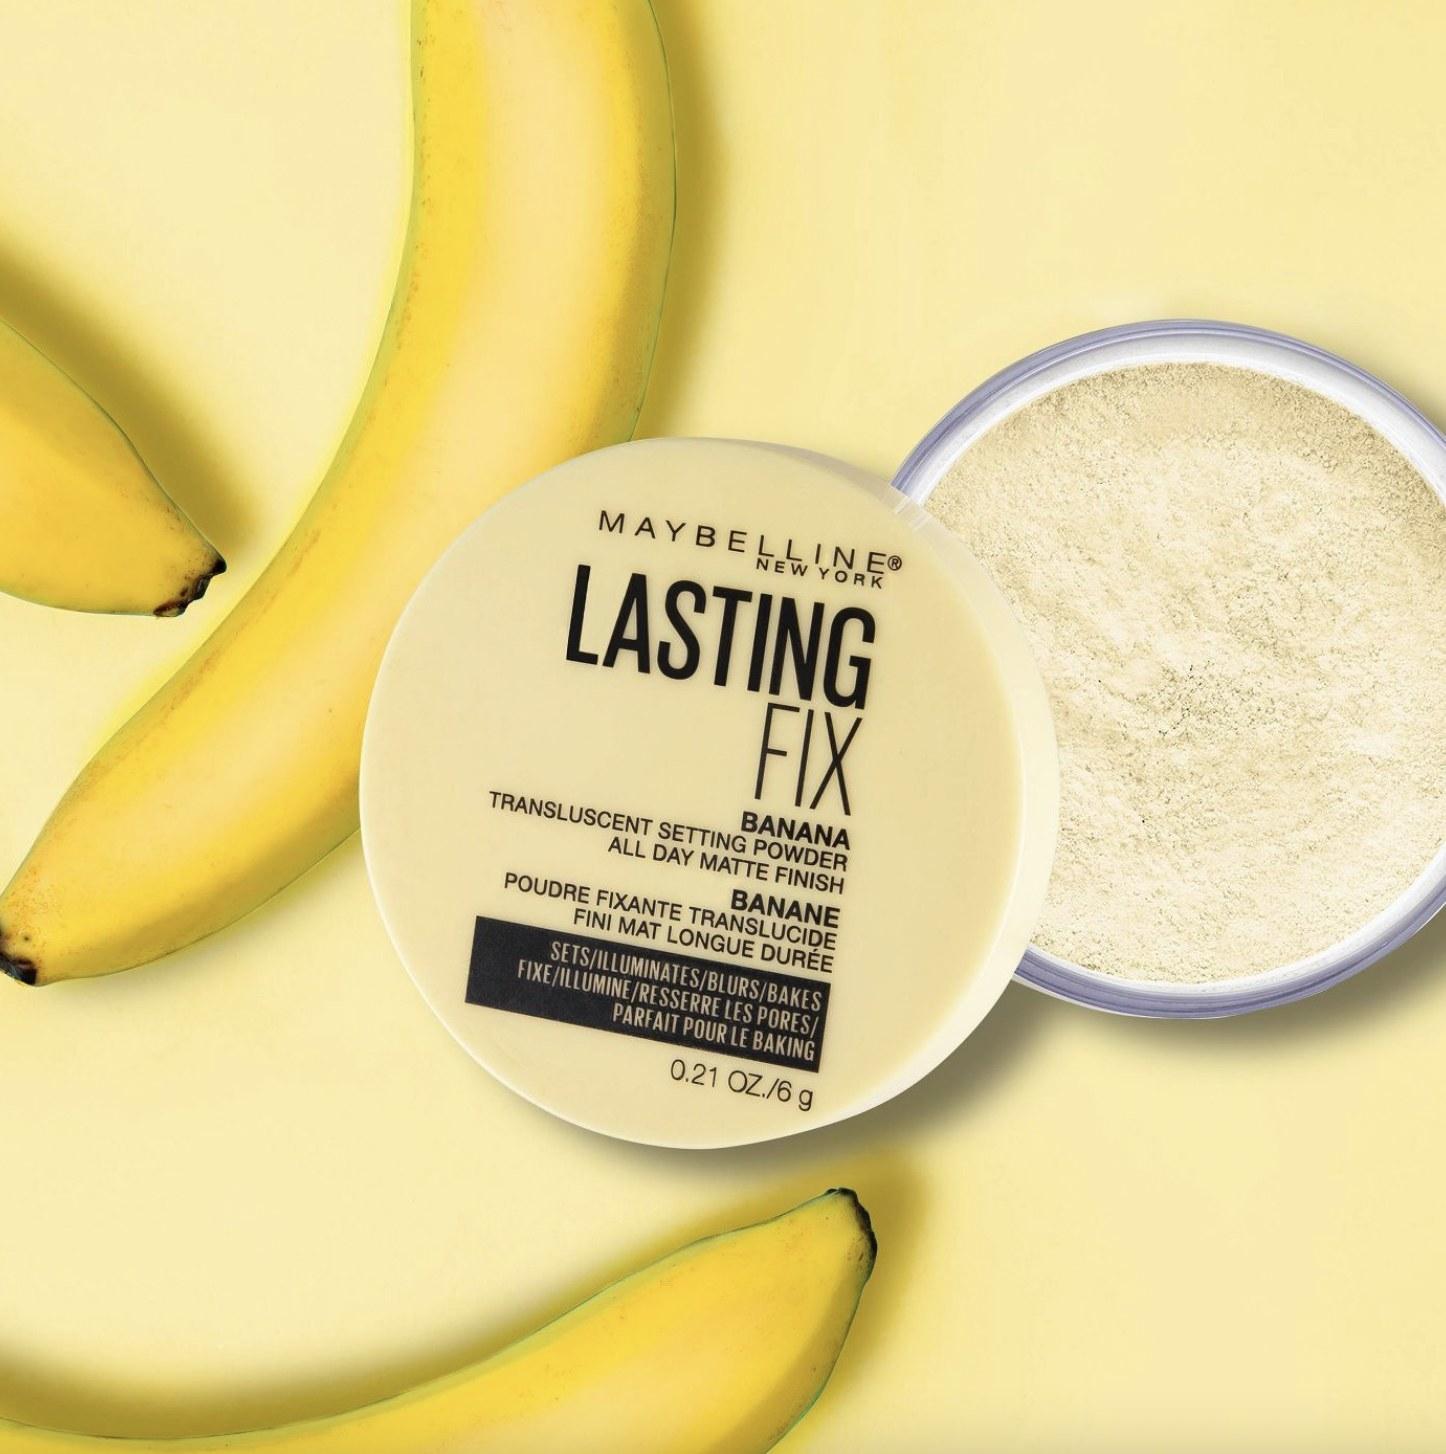 A jar of setting powder with bananas